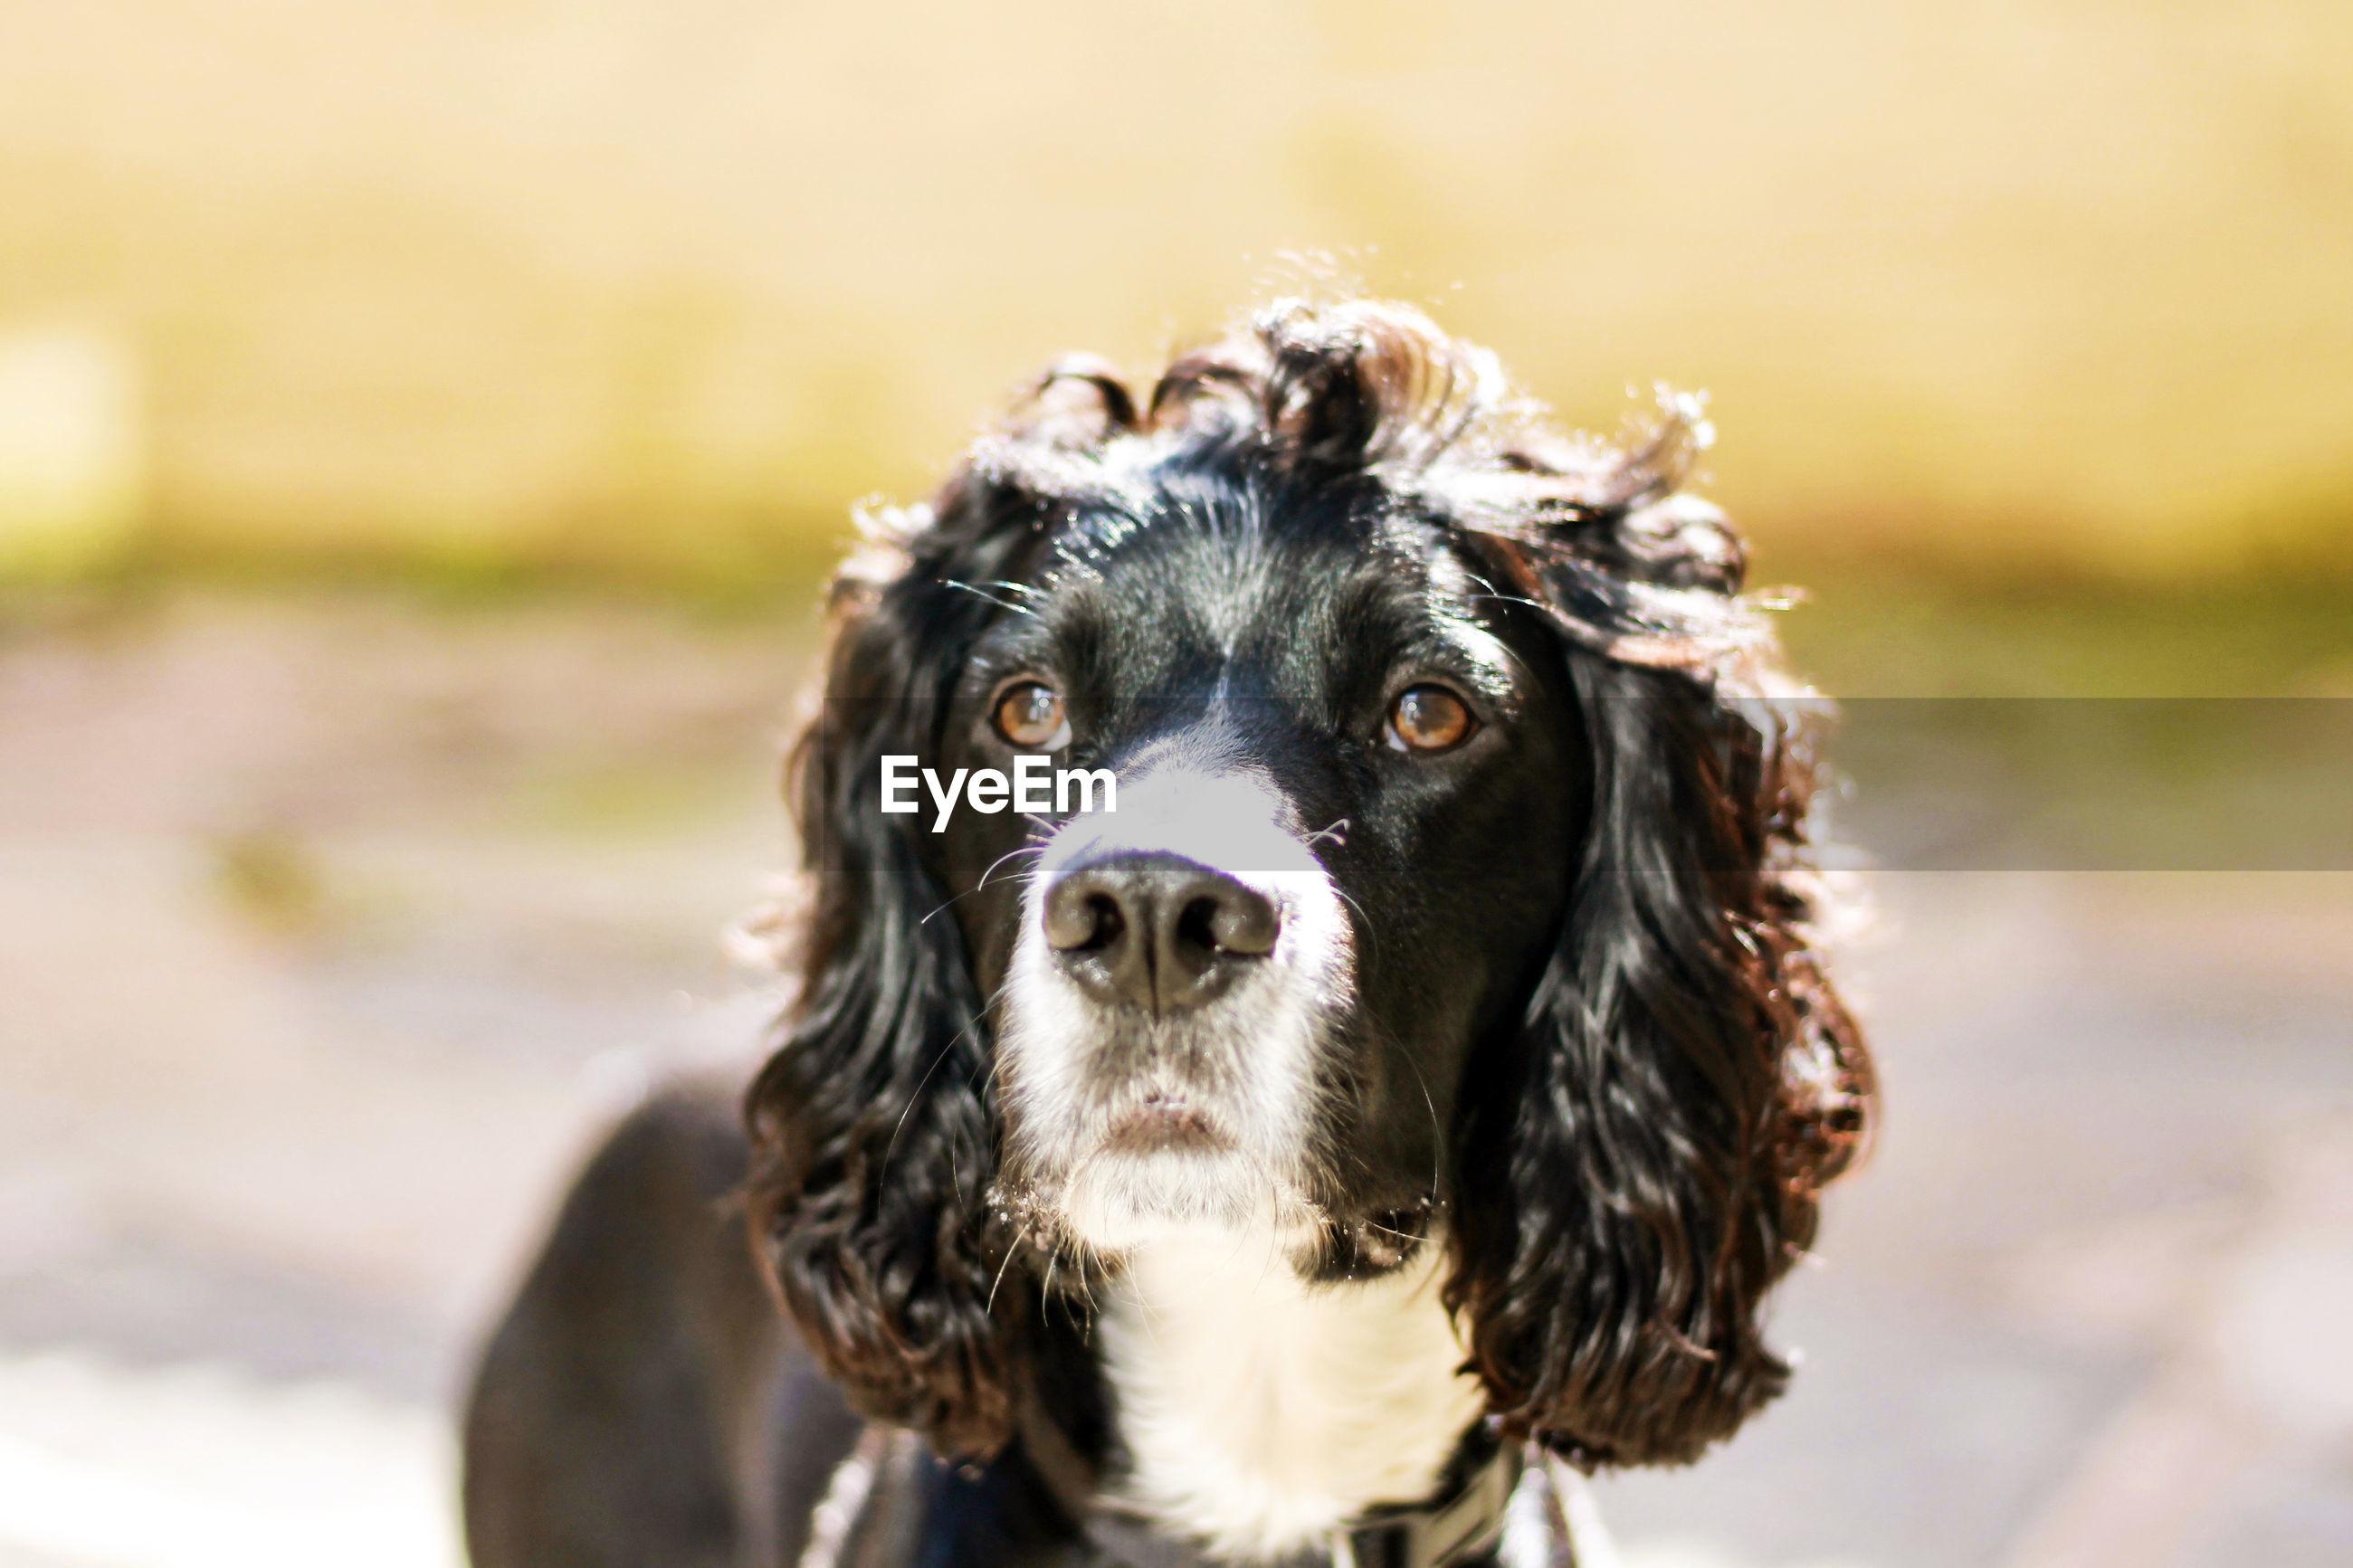 CLOSE-UP PORTRAIT OF DOG AT CAMERA